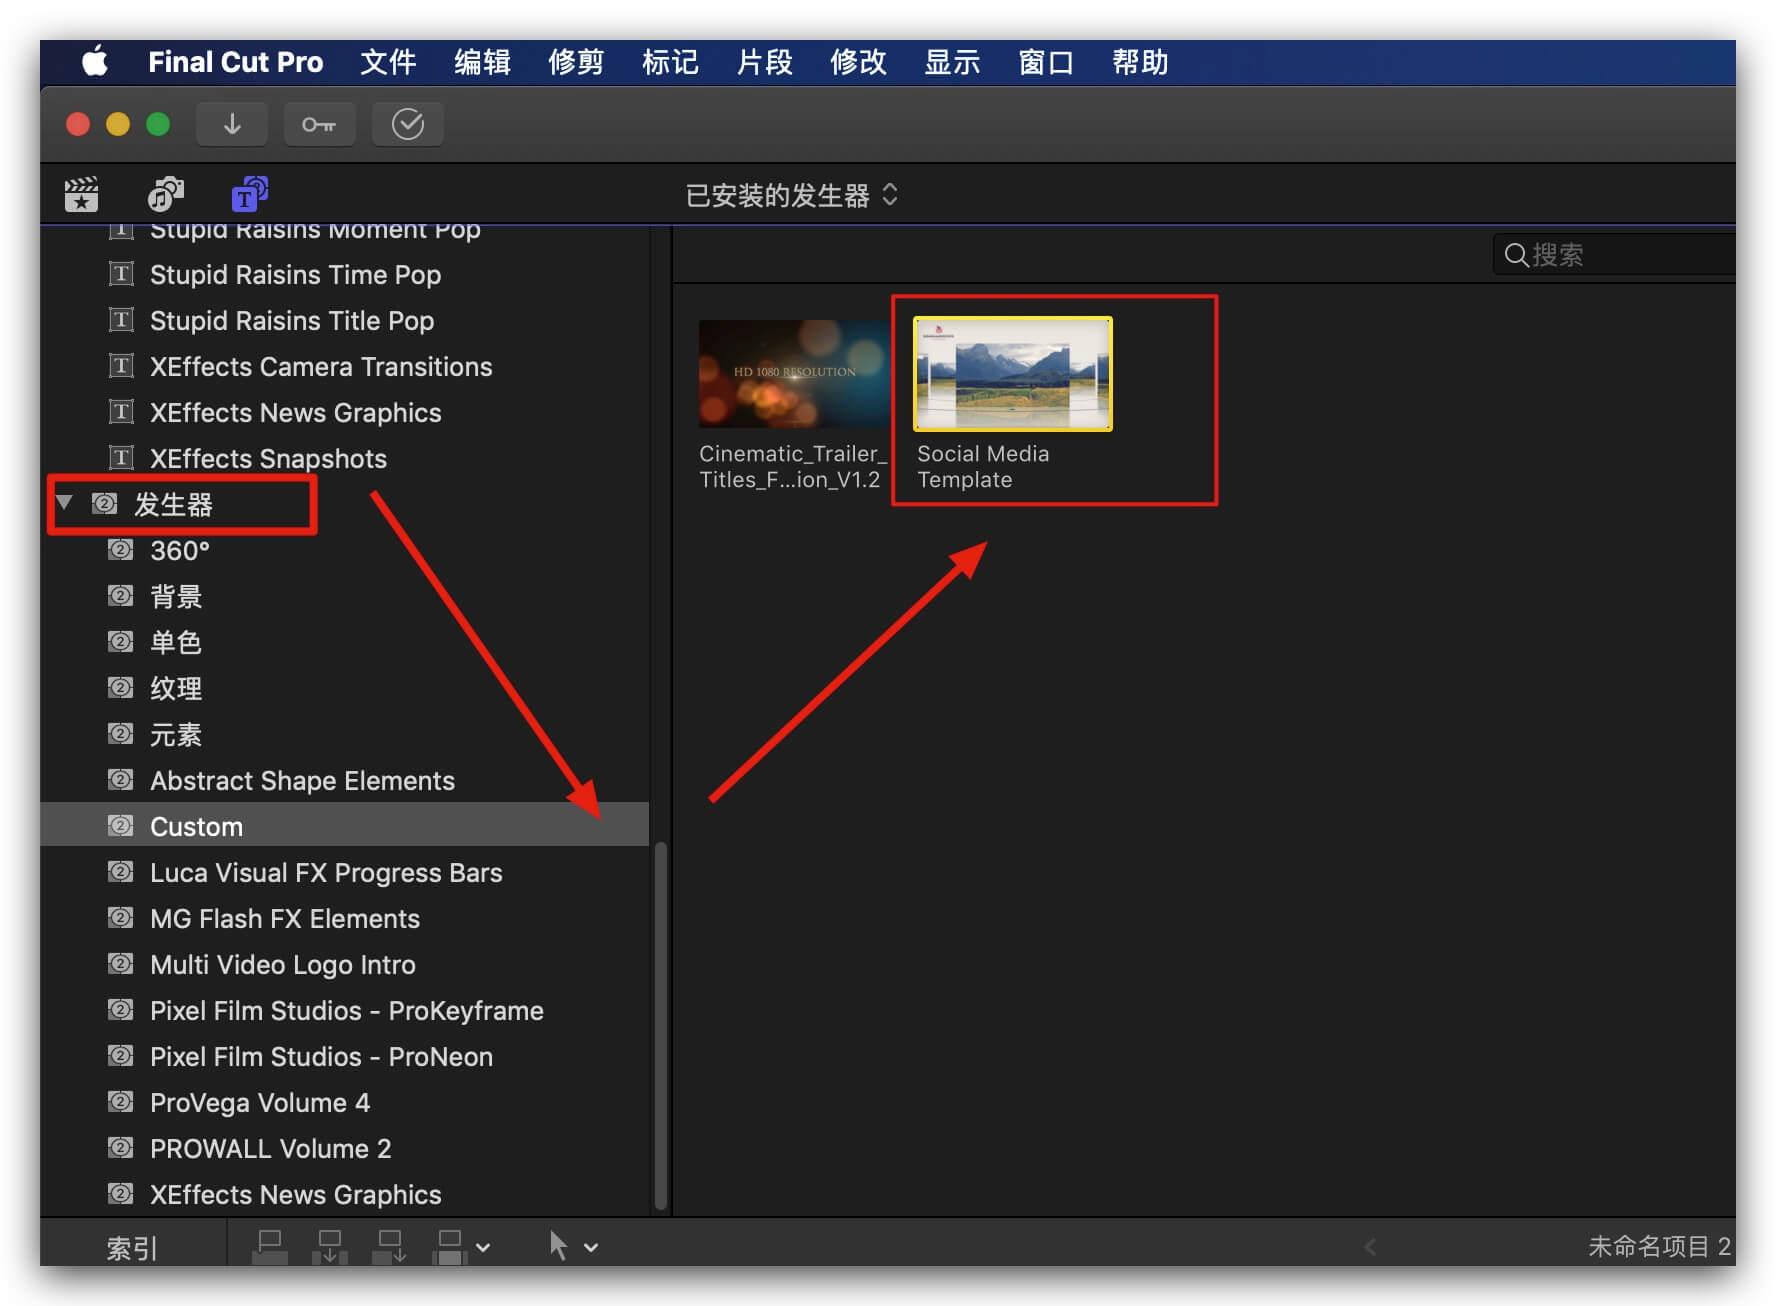 Fcpx插件 3D图片视频旋转轮播展示模板 Social Media Slideshow | MAC影视后期资源站